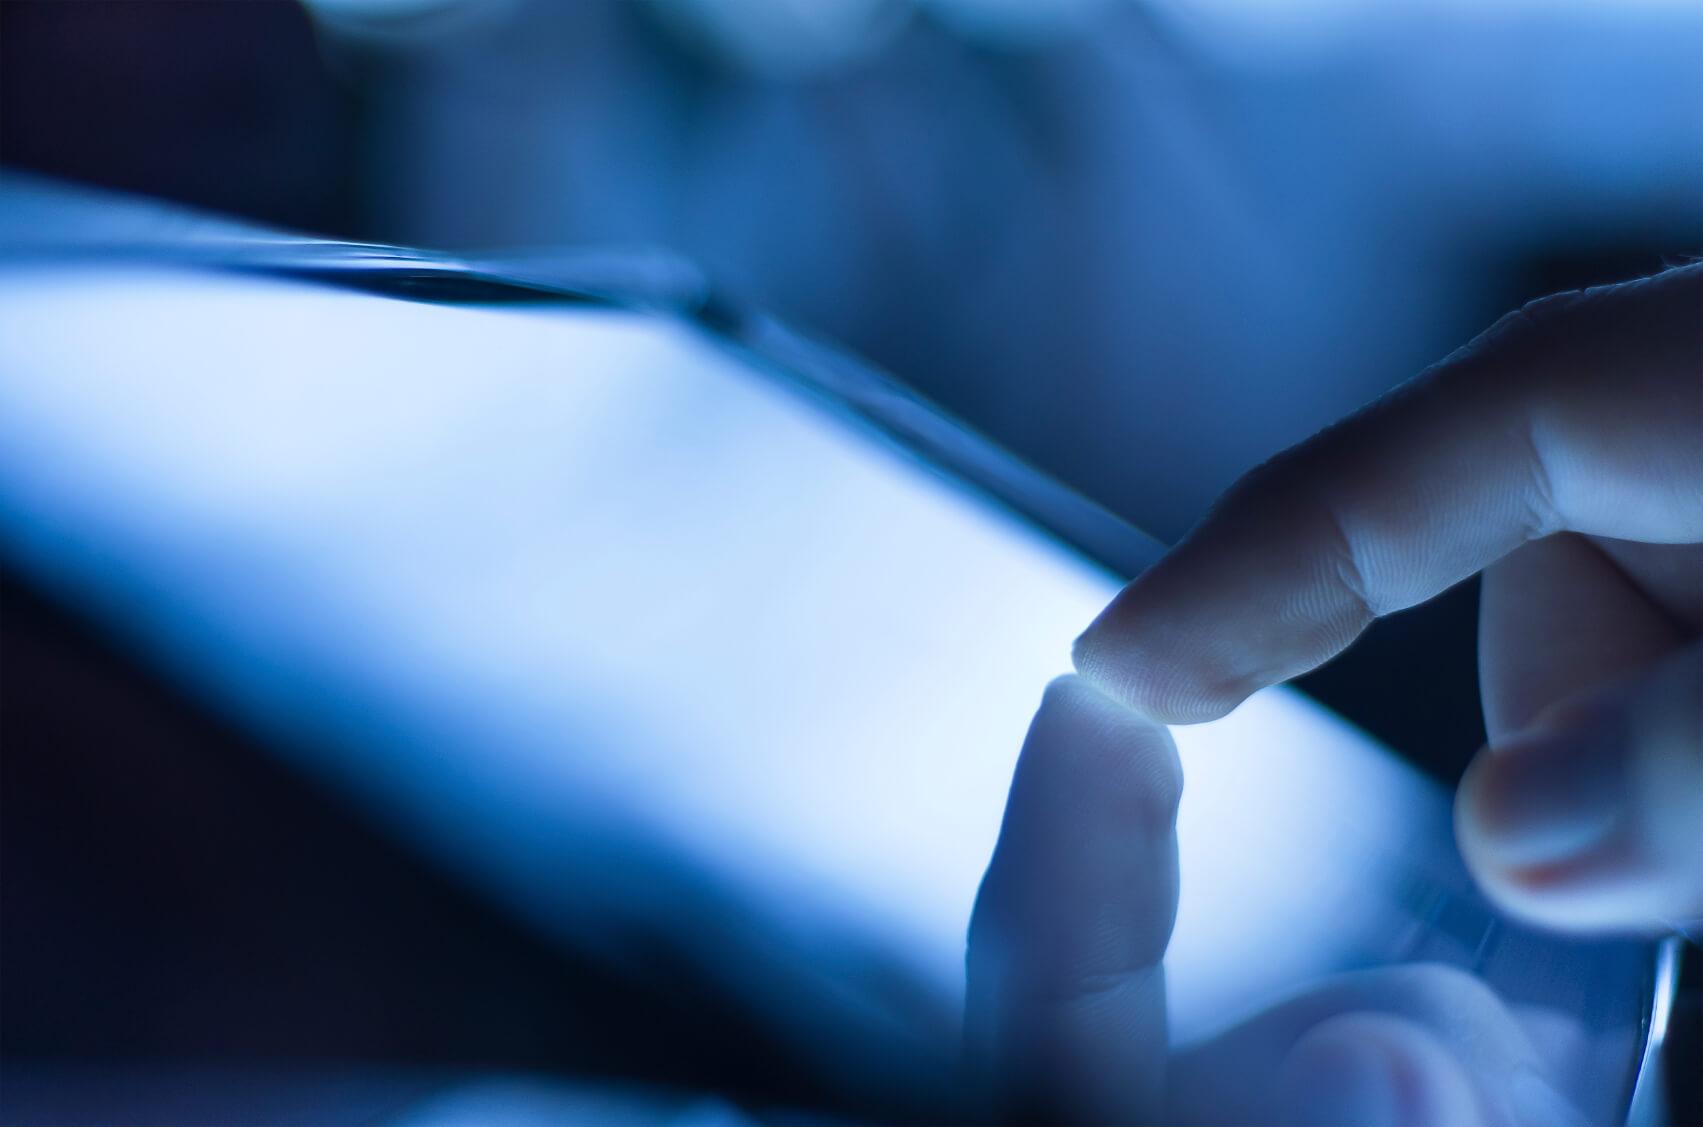 Finger touching digital screen